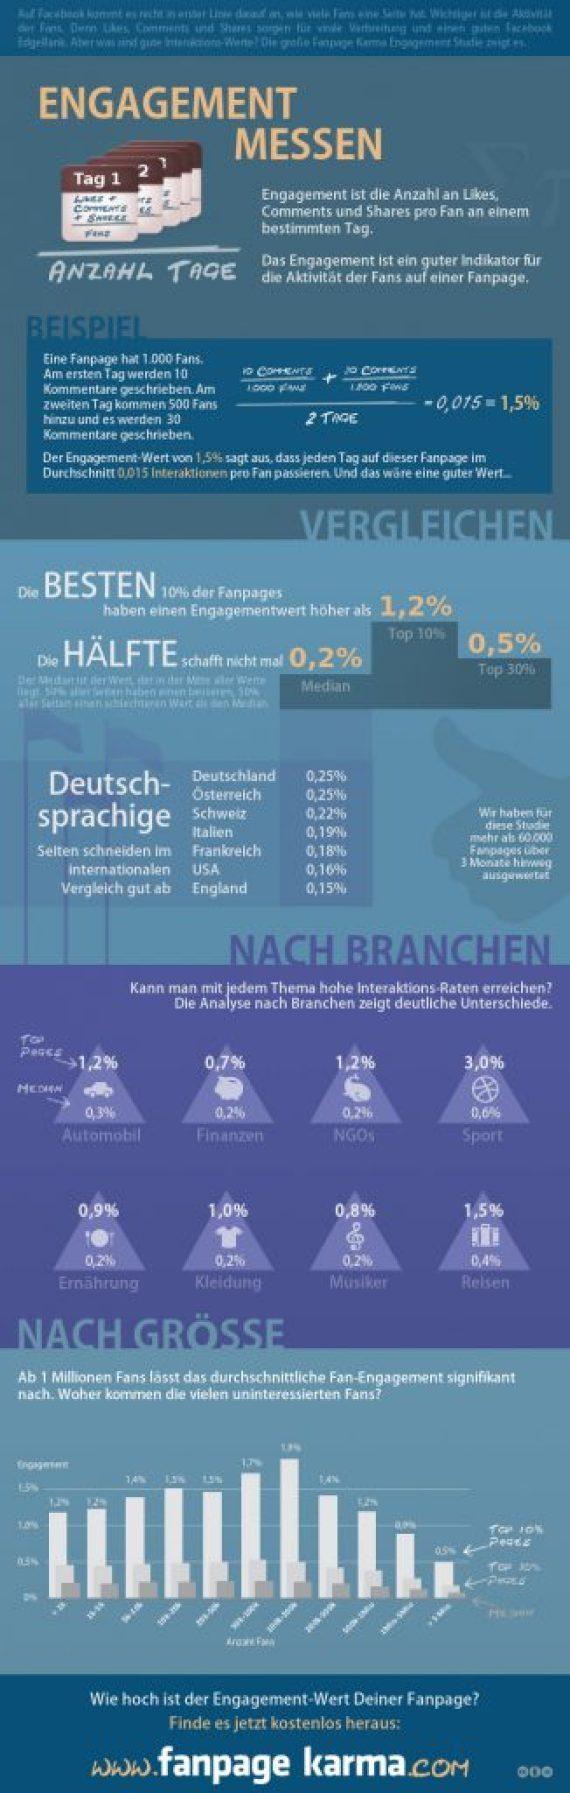 Fanpage Karma Engagement Studie Facebook